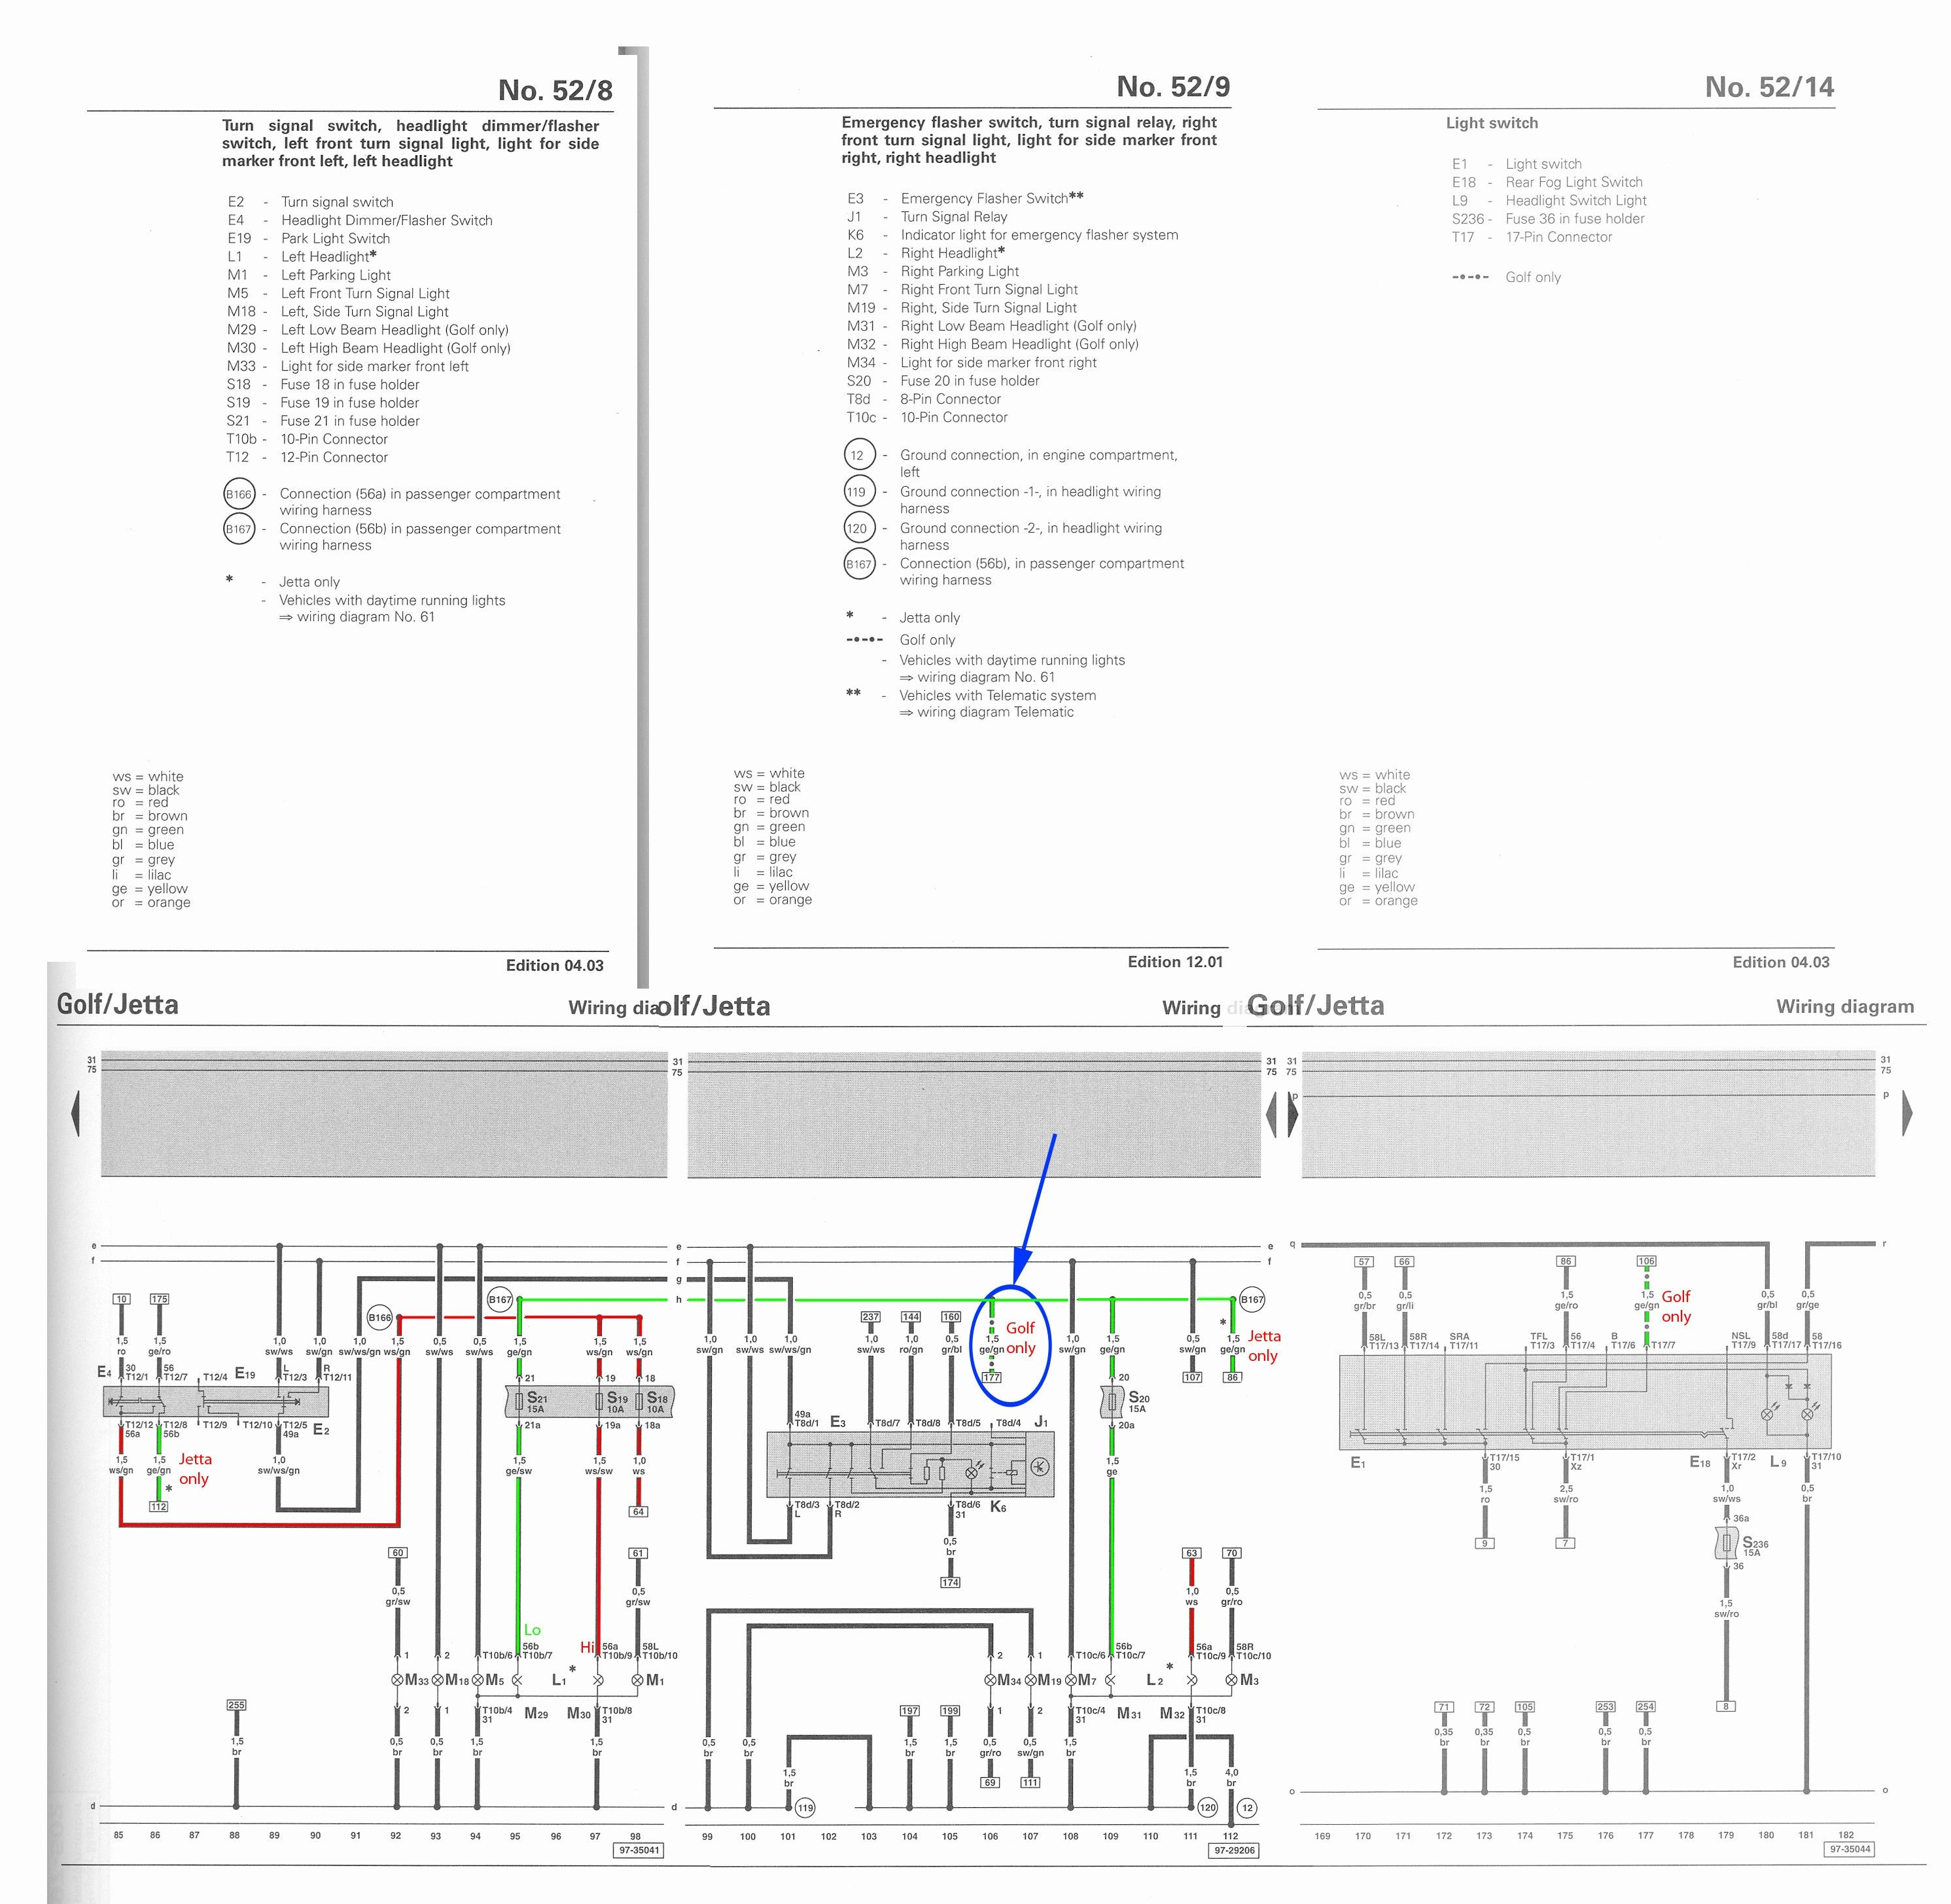 Best Of Wiring Diagram for Daytime Running Lights #diagrams ... Daytime Running Light Wiring Diagram on